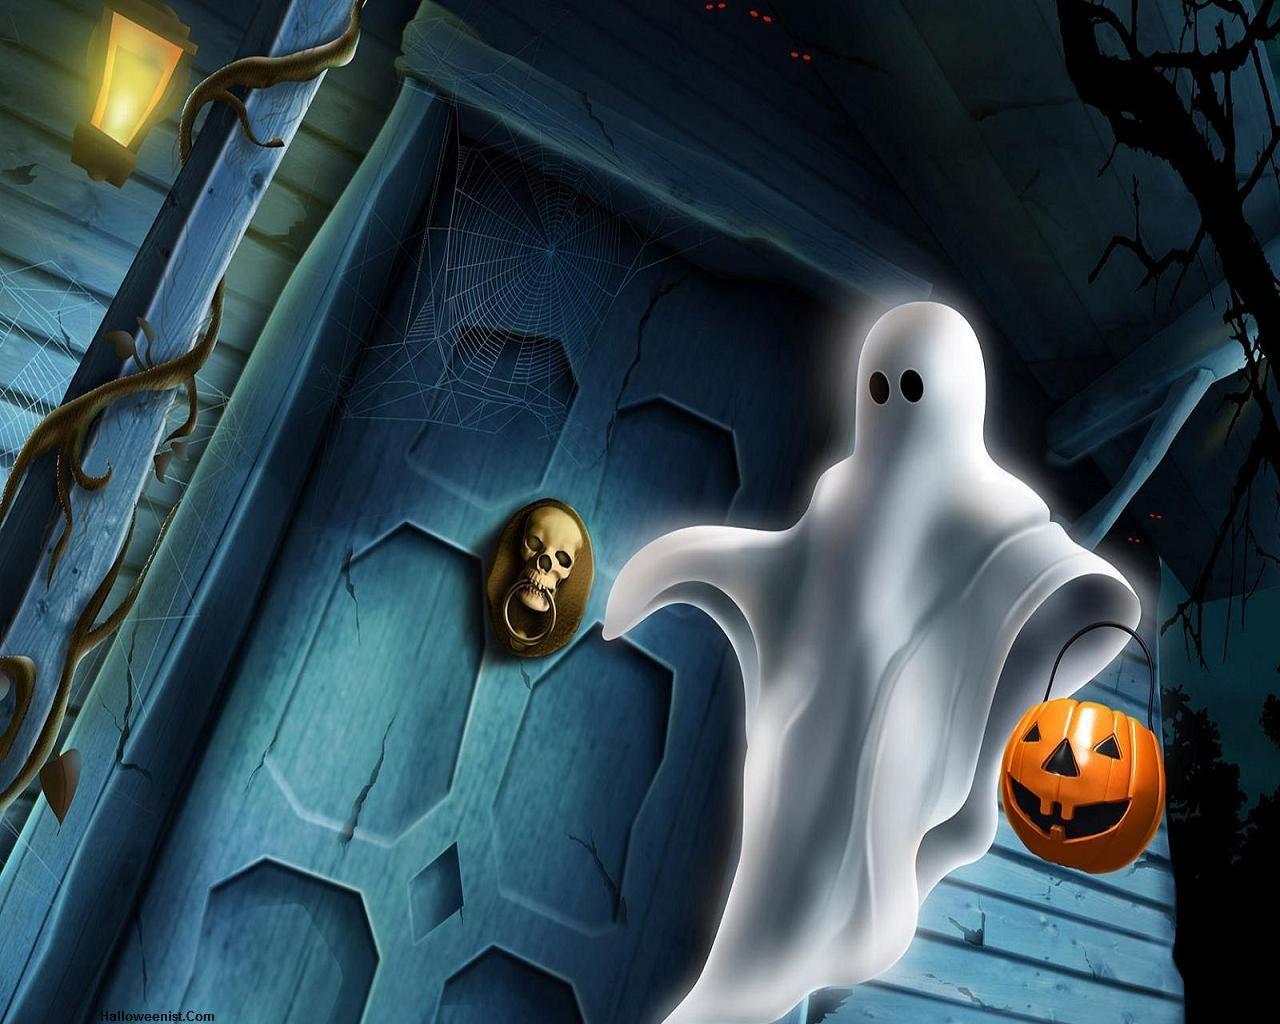 Best Wallpaper Halloween Unique - f18a8e04a89b585909d935b04ce5af8c  Snapshot_672210.jpg